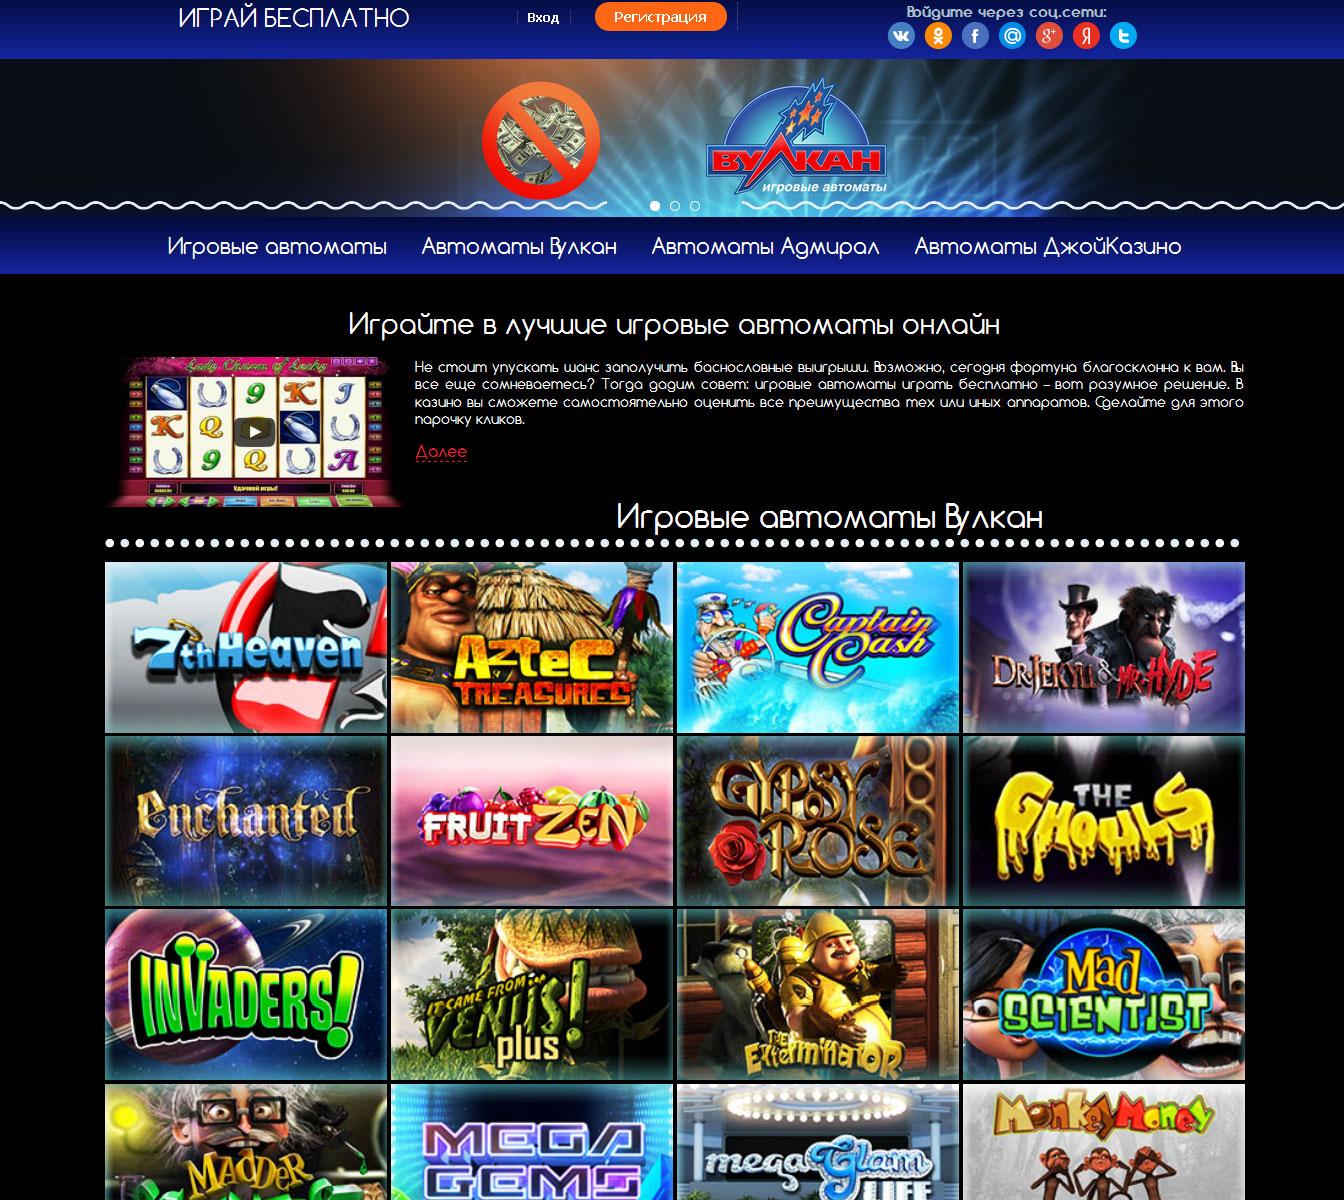 Игровой автомат легенда онлайн казино Вулкан